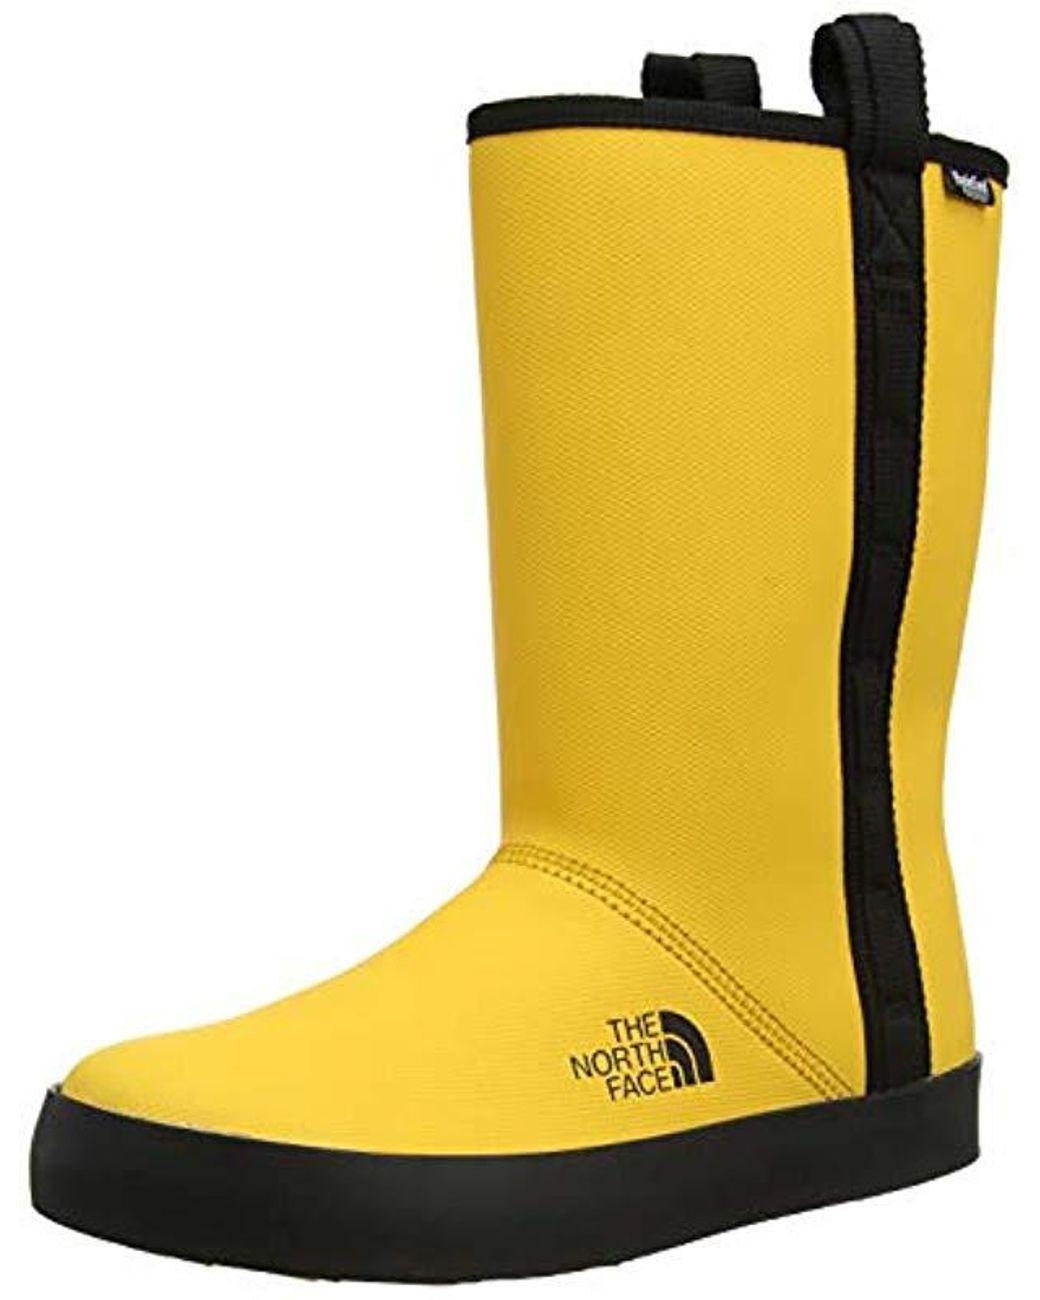 innovative design 3ac25 1bc5c Damen Base Camp Rain Shorty Gummistiefel in gelb